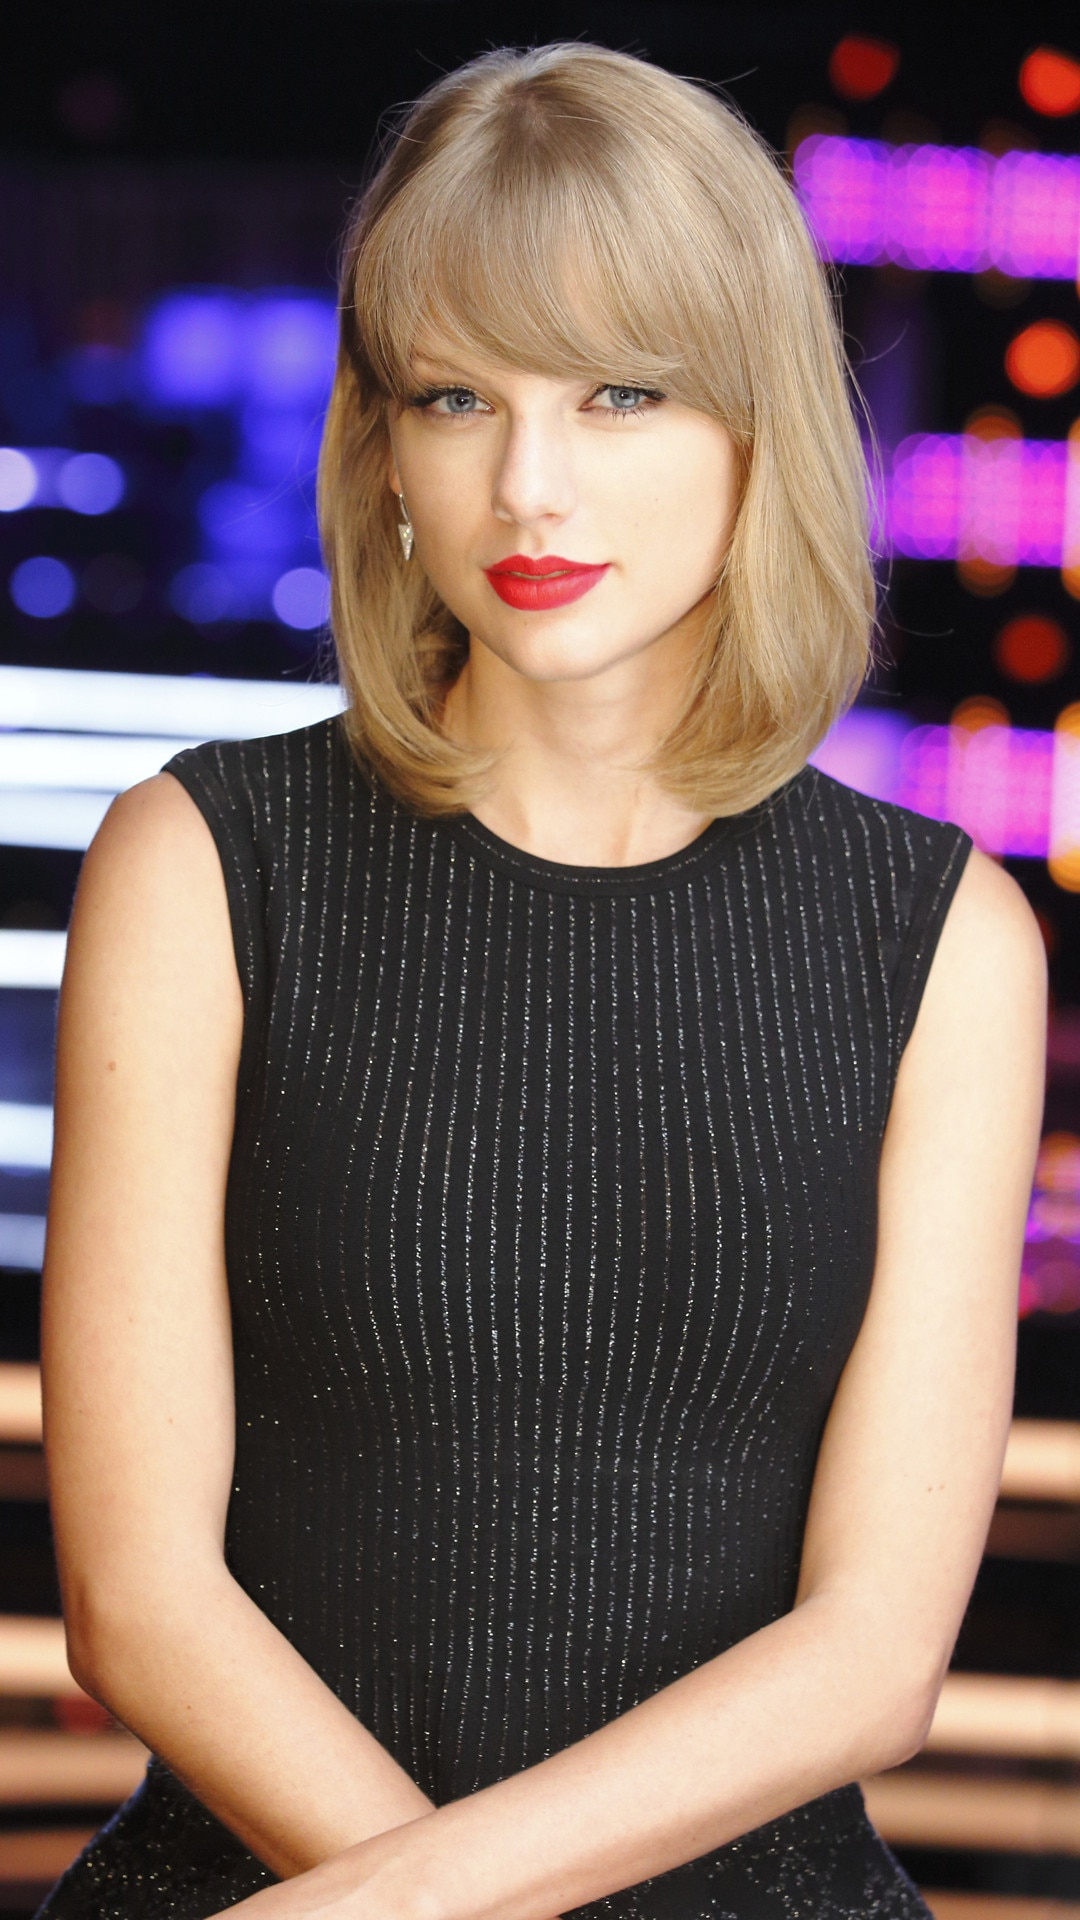 Taylor Swift 1920 X 1080